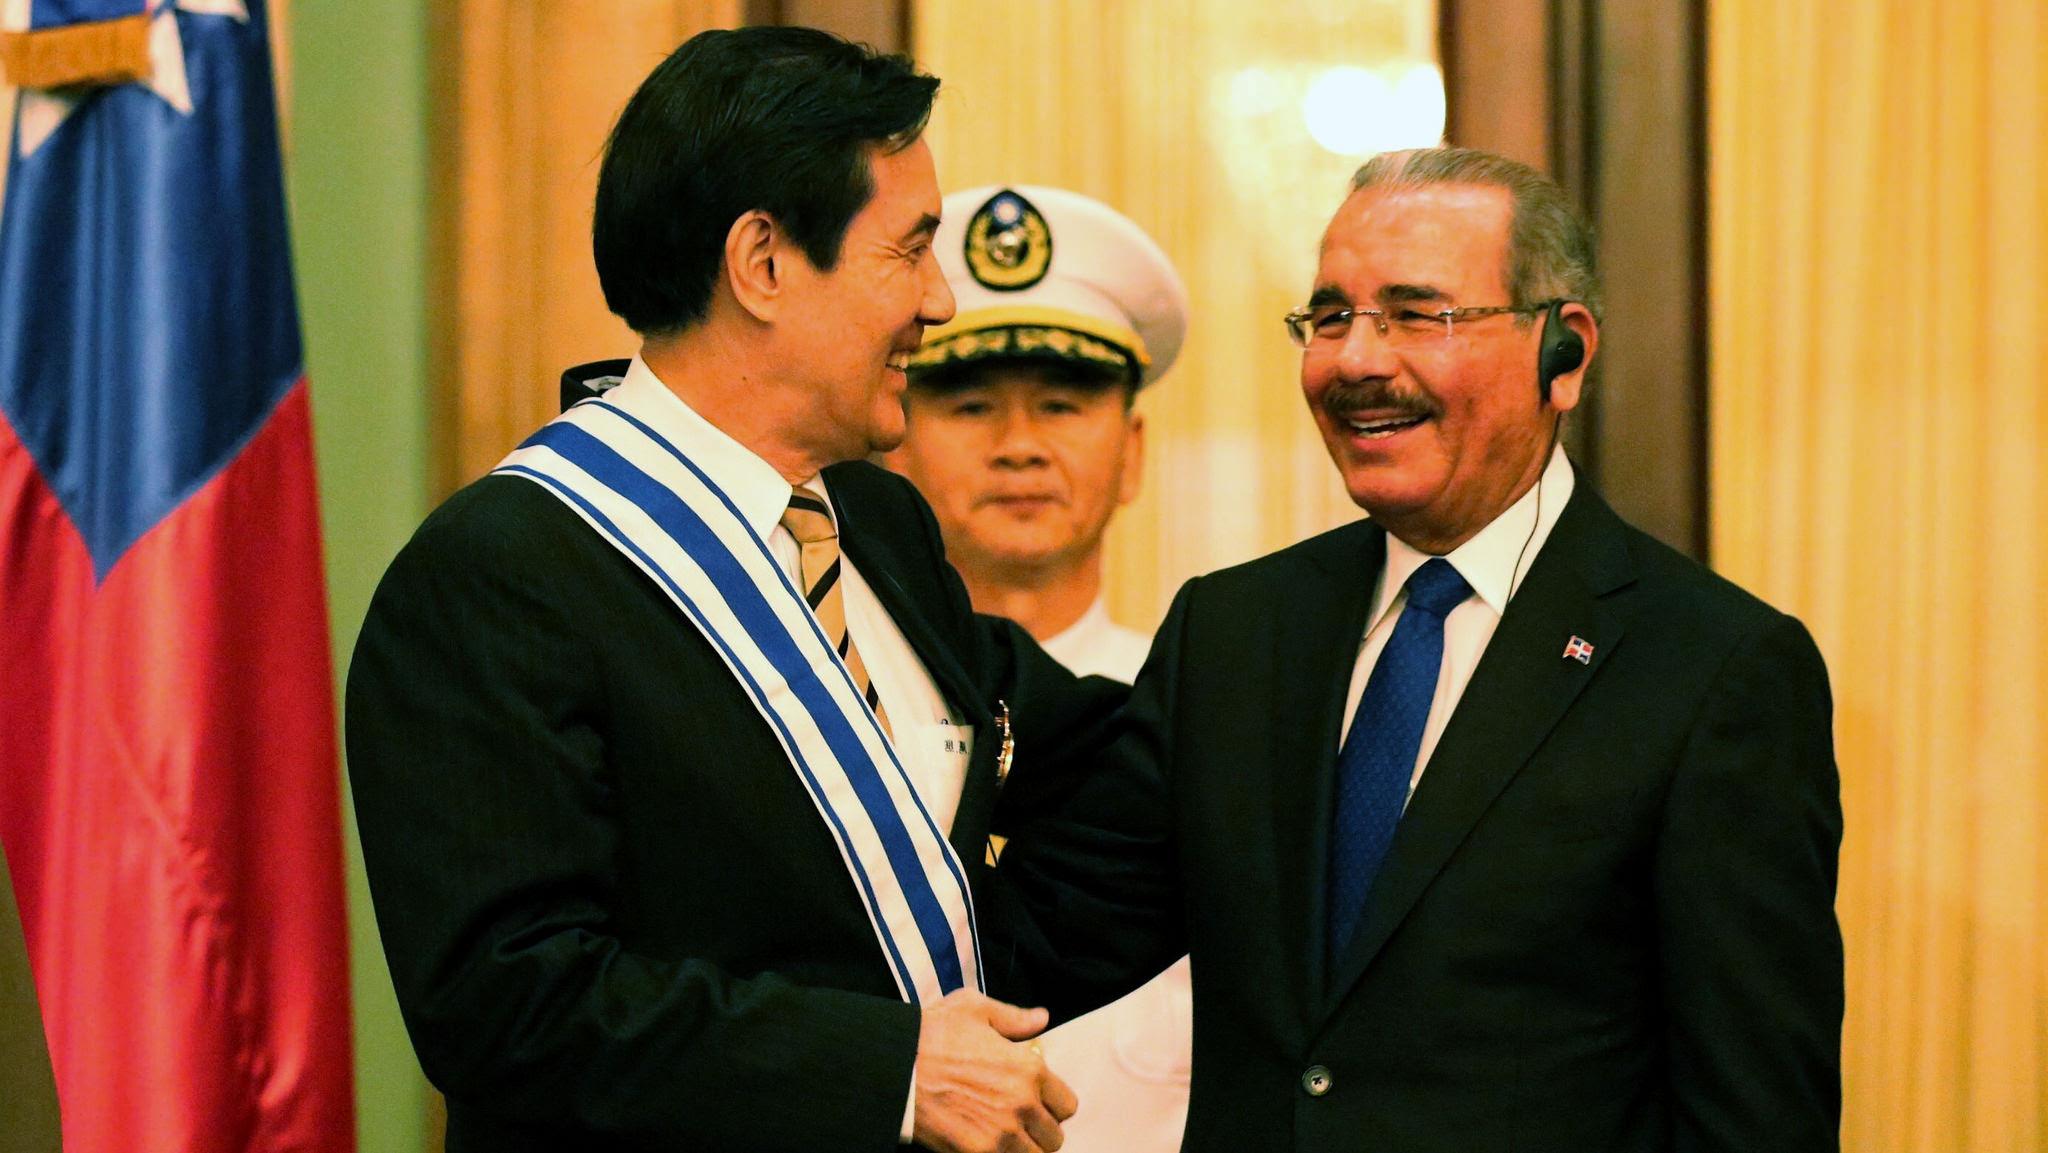 Presidente Medina recibe a Ma Ying-jeou: se fortalecen lazos con Taiwán